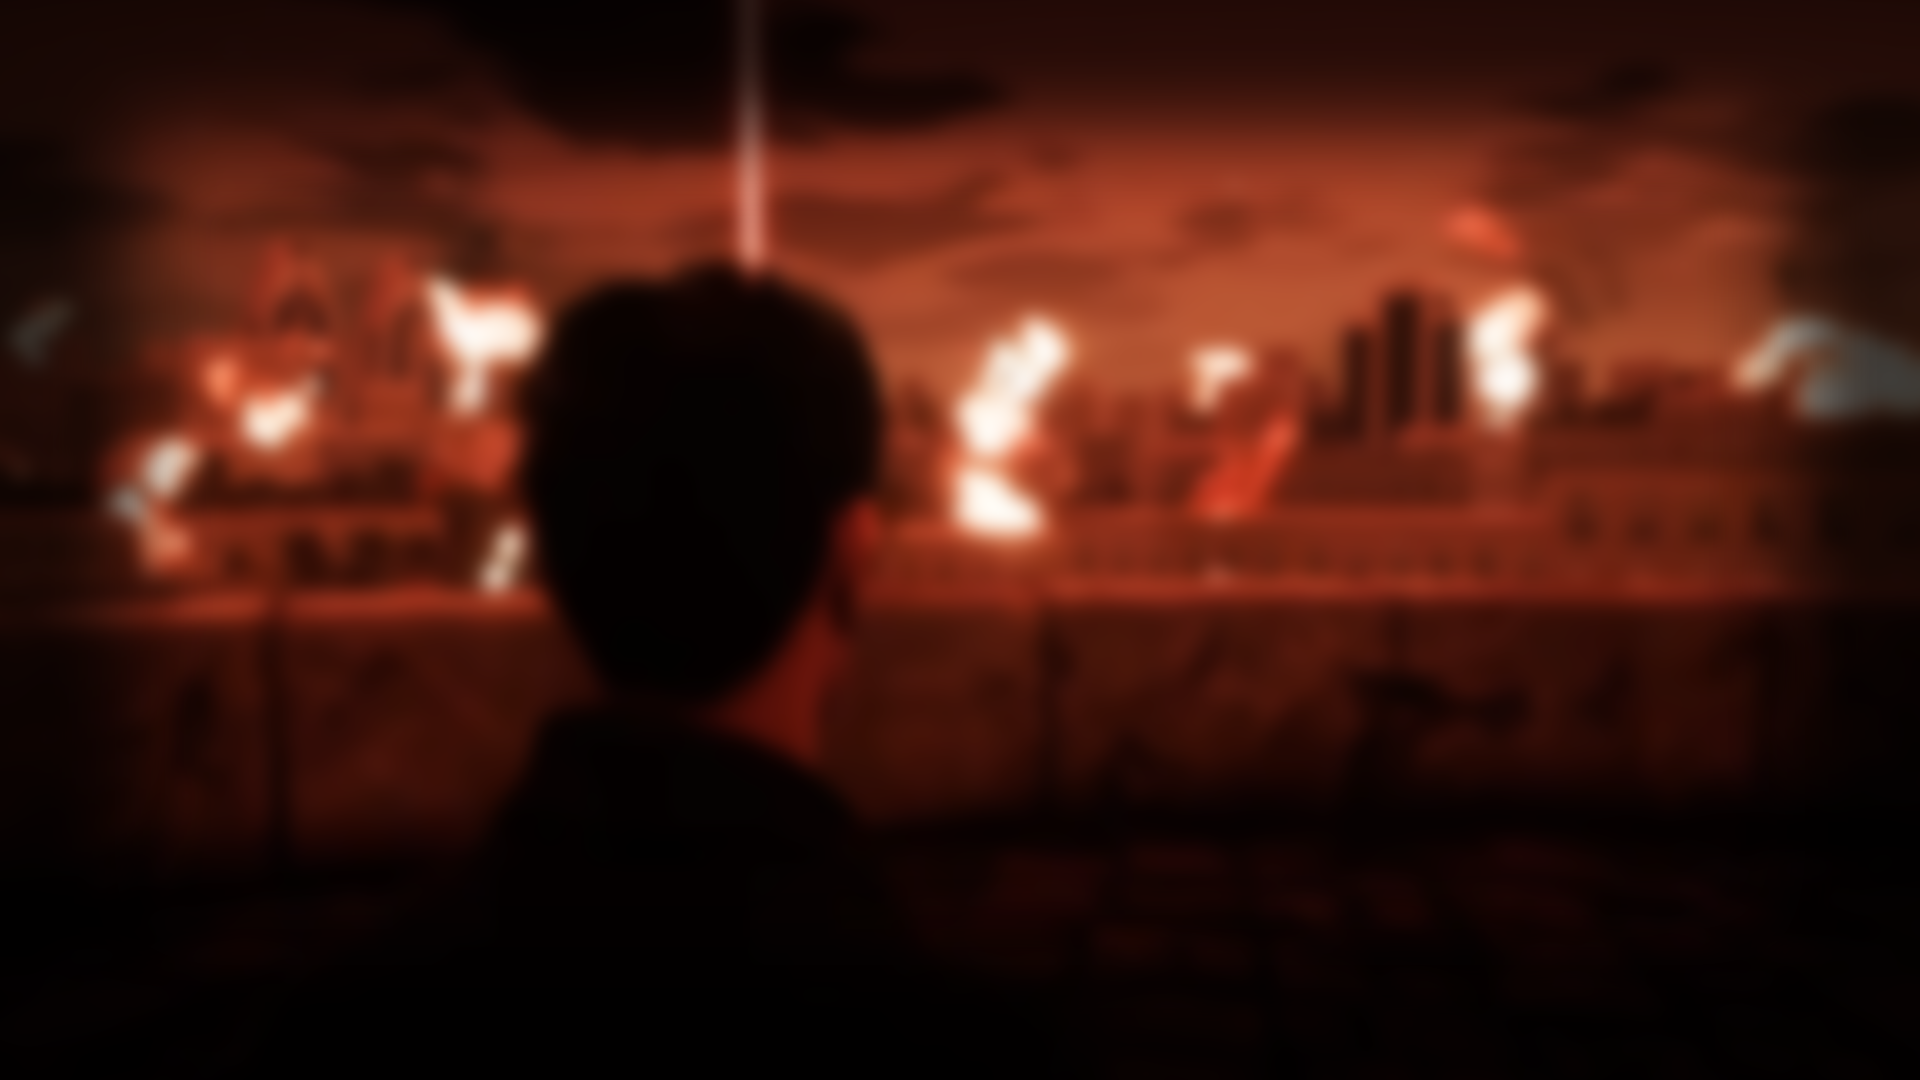 Icon for Apocalypse now